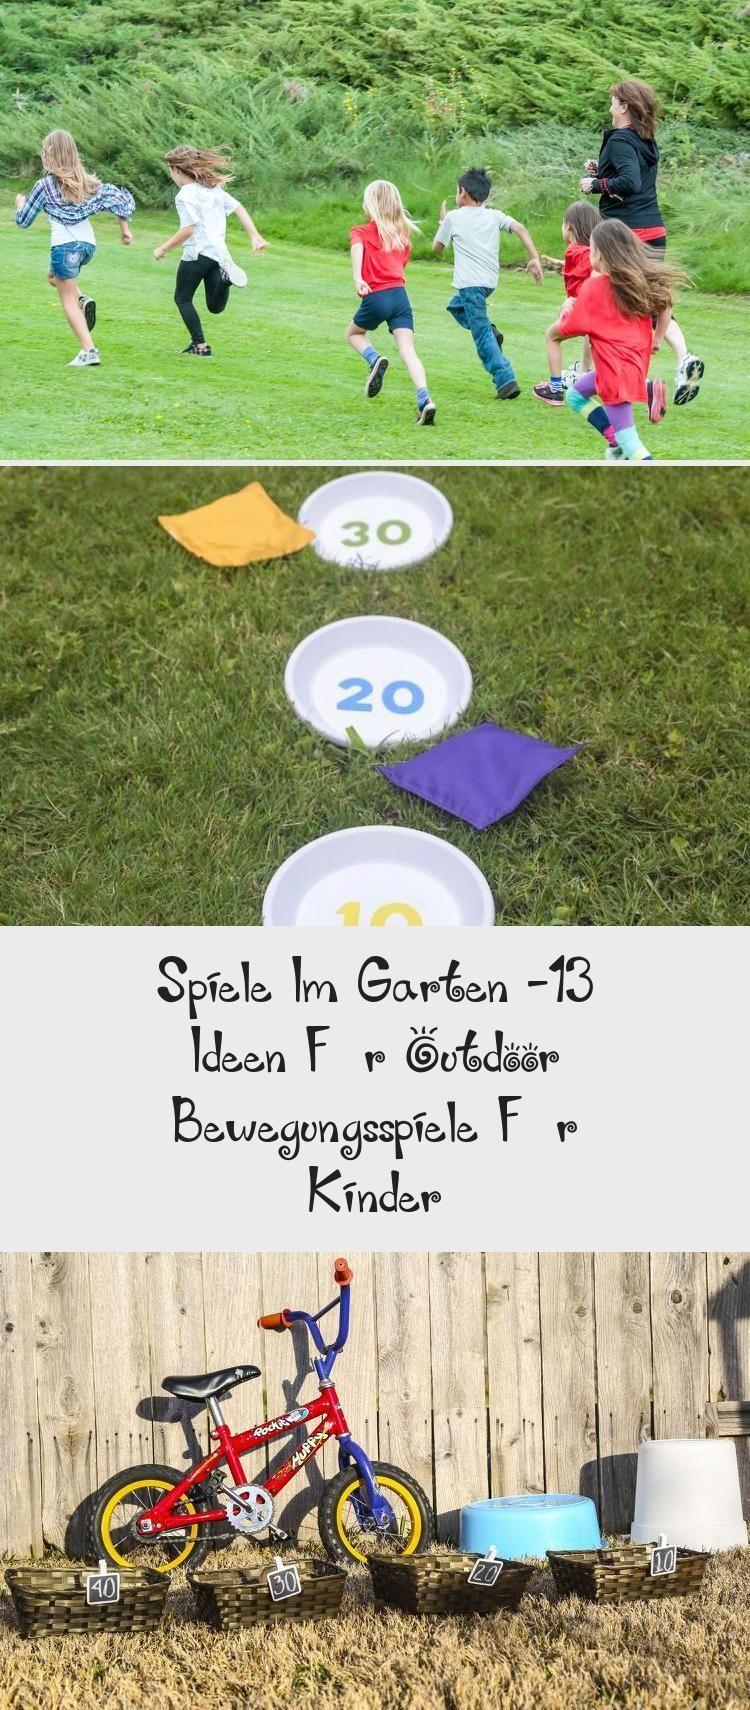 Spiele Im Garten 13 Ideen Fur Outdoor Ubungsspiele Fur Kinder Sandbox In 2020 Spiele Im Garten Kinder Sandkasten Kinderspielplatz